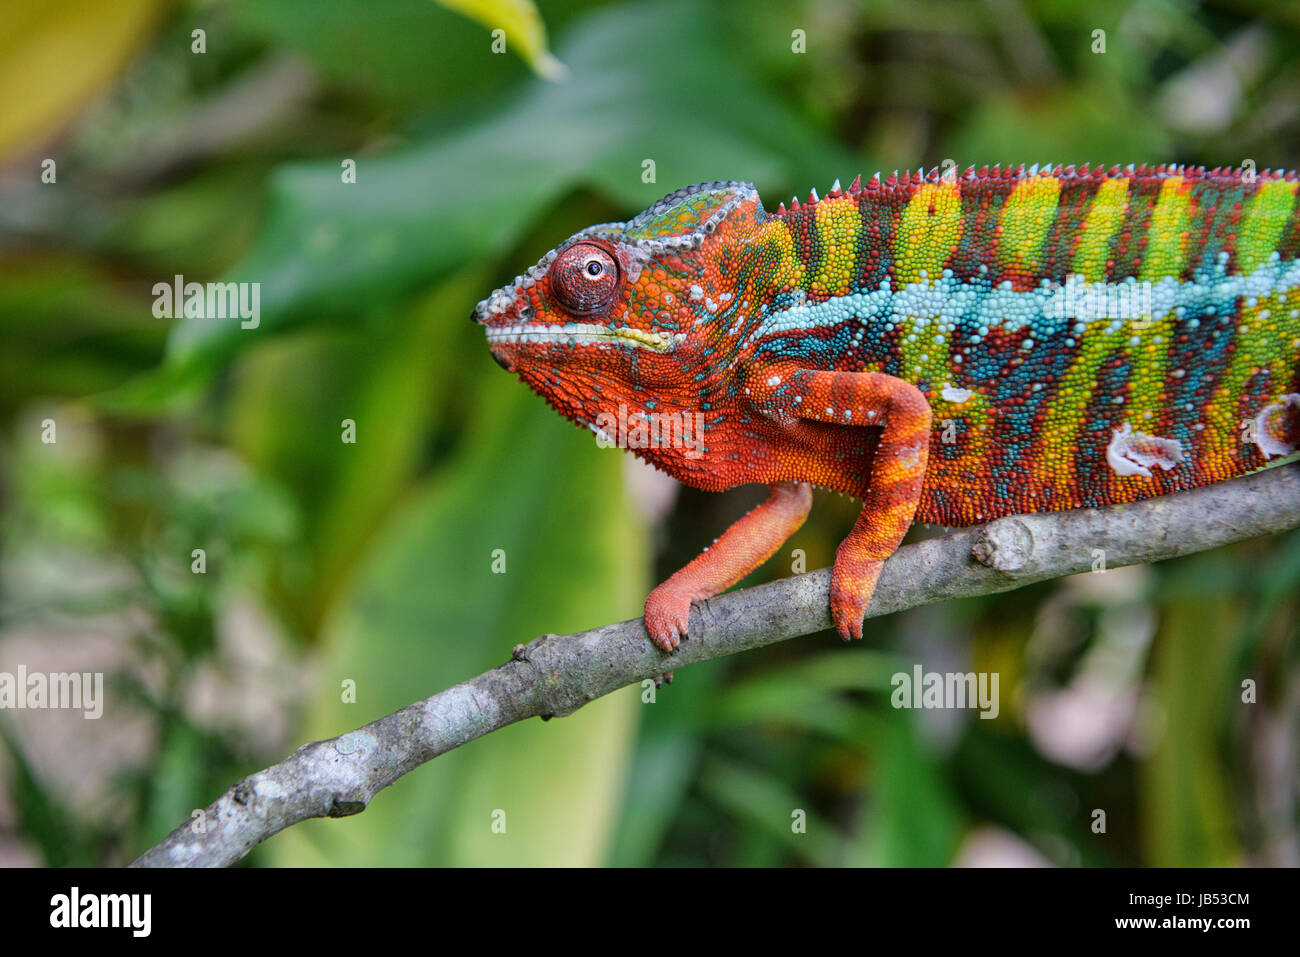 Colourful Panther chameleon (Furcifer pardalis), Andasibe, Madagascar - Stock Image